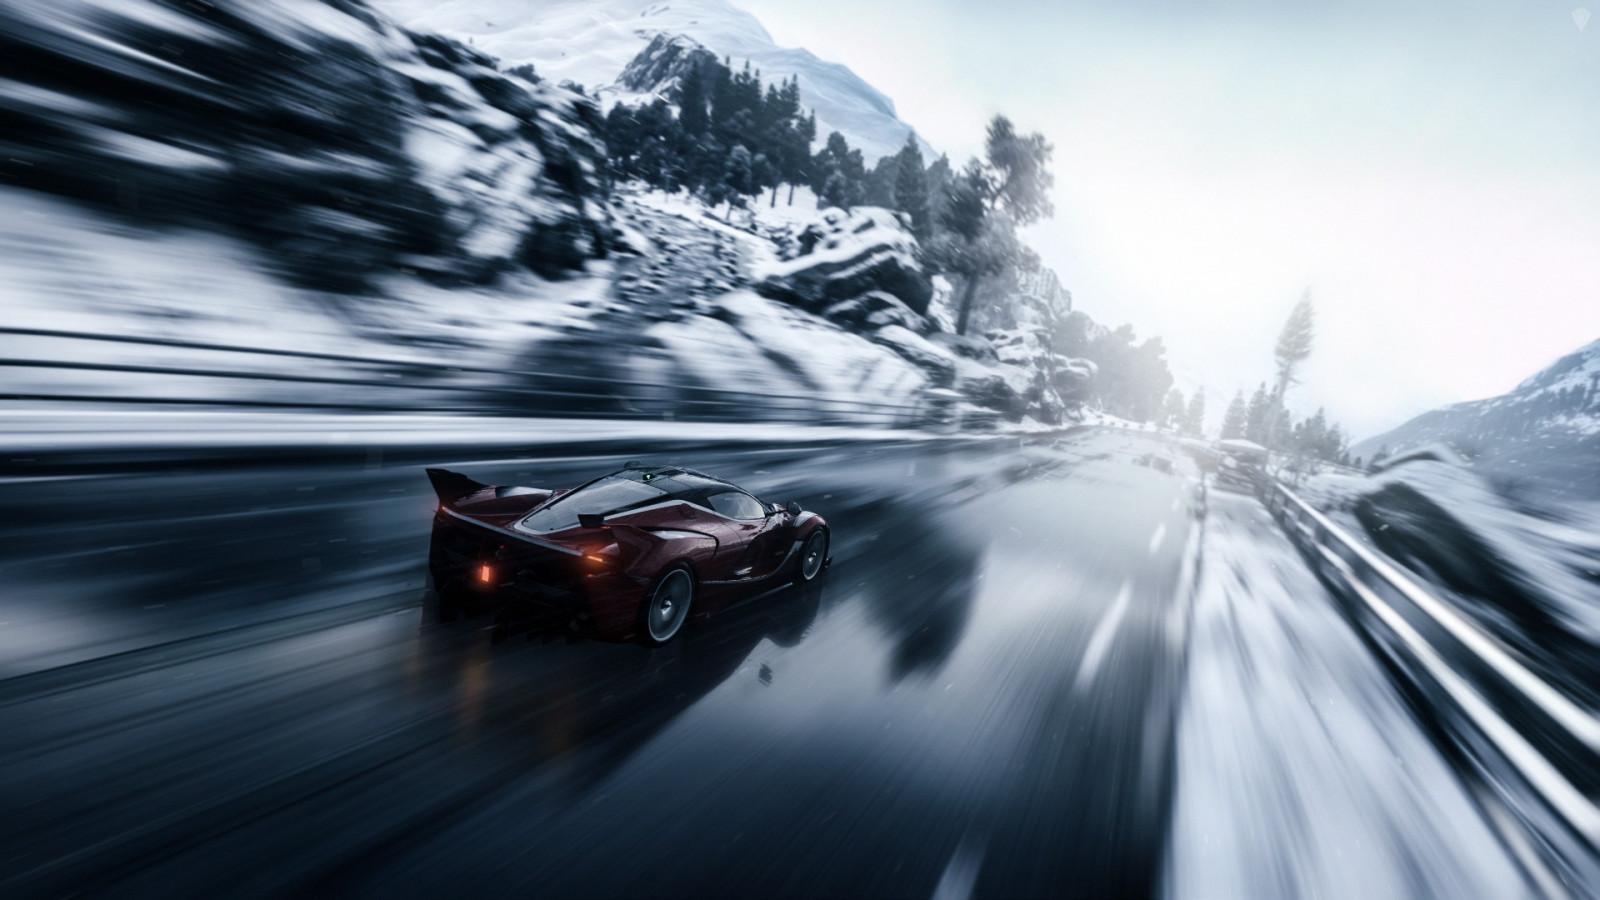 Auto Videospiele